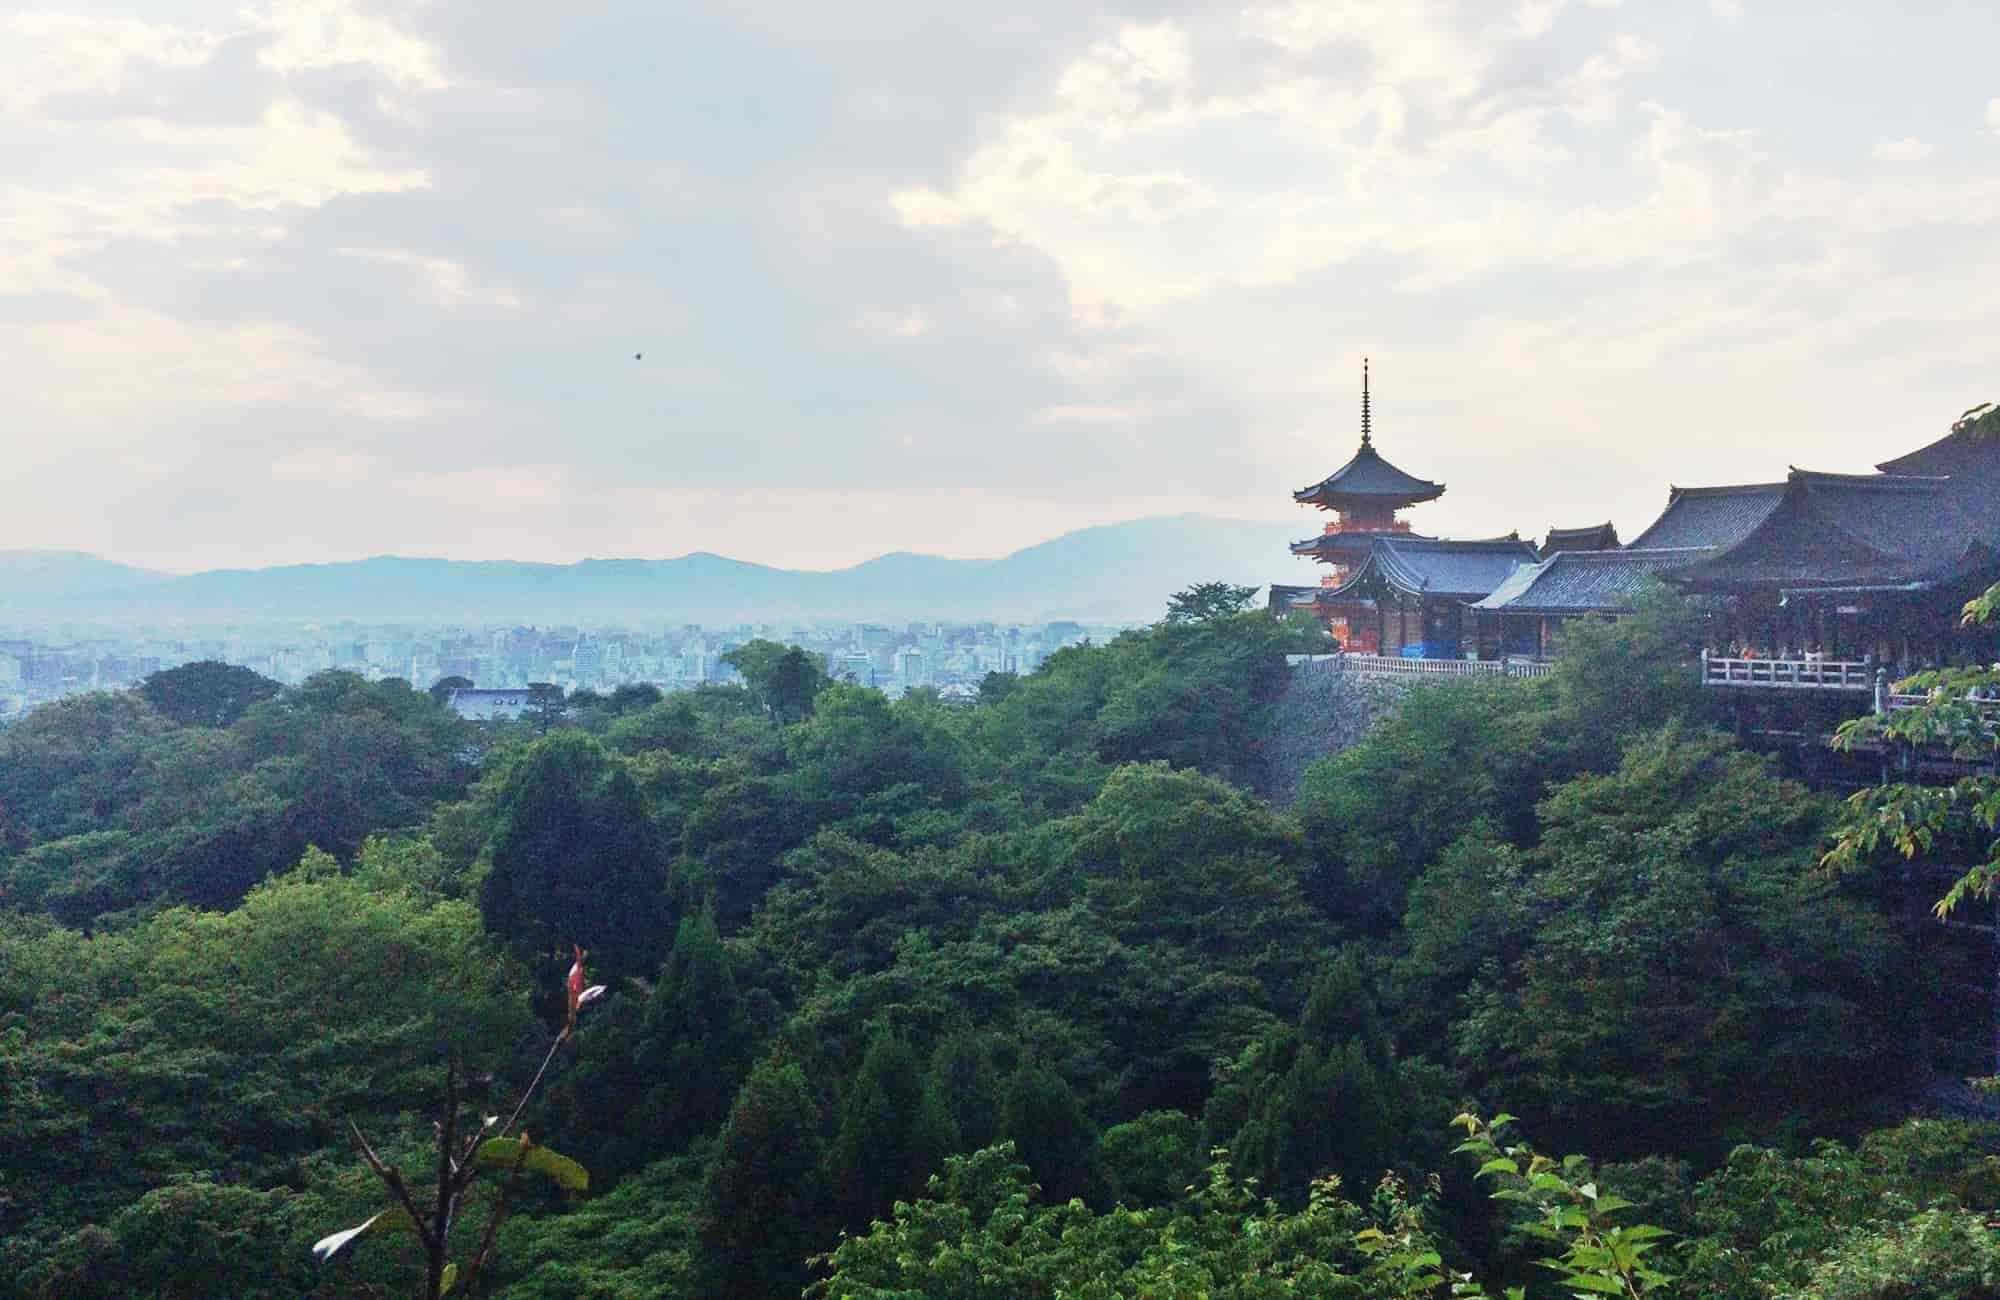 Voyage au Japon - Kyoto - Amplitudes